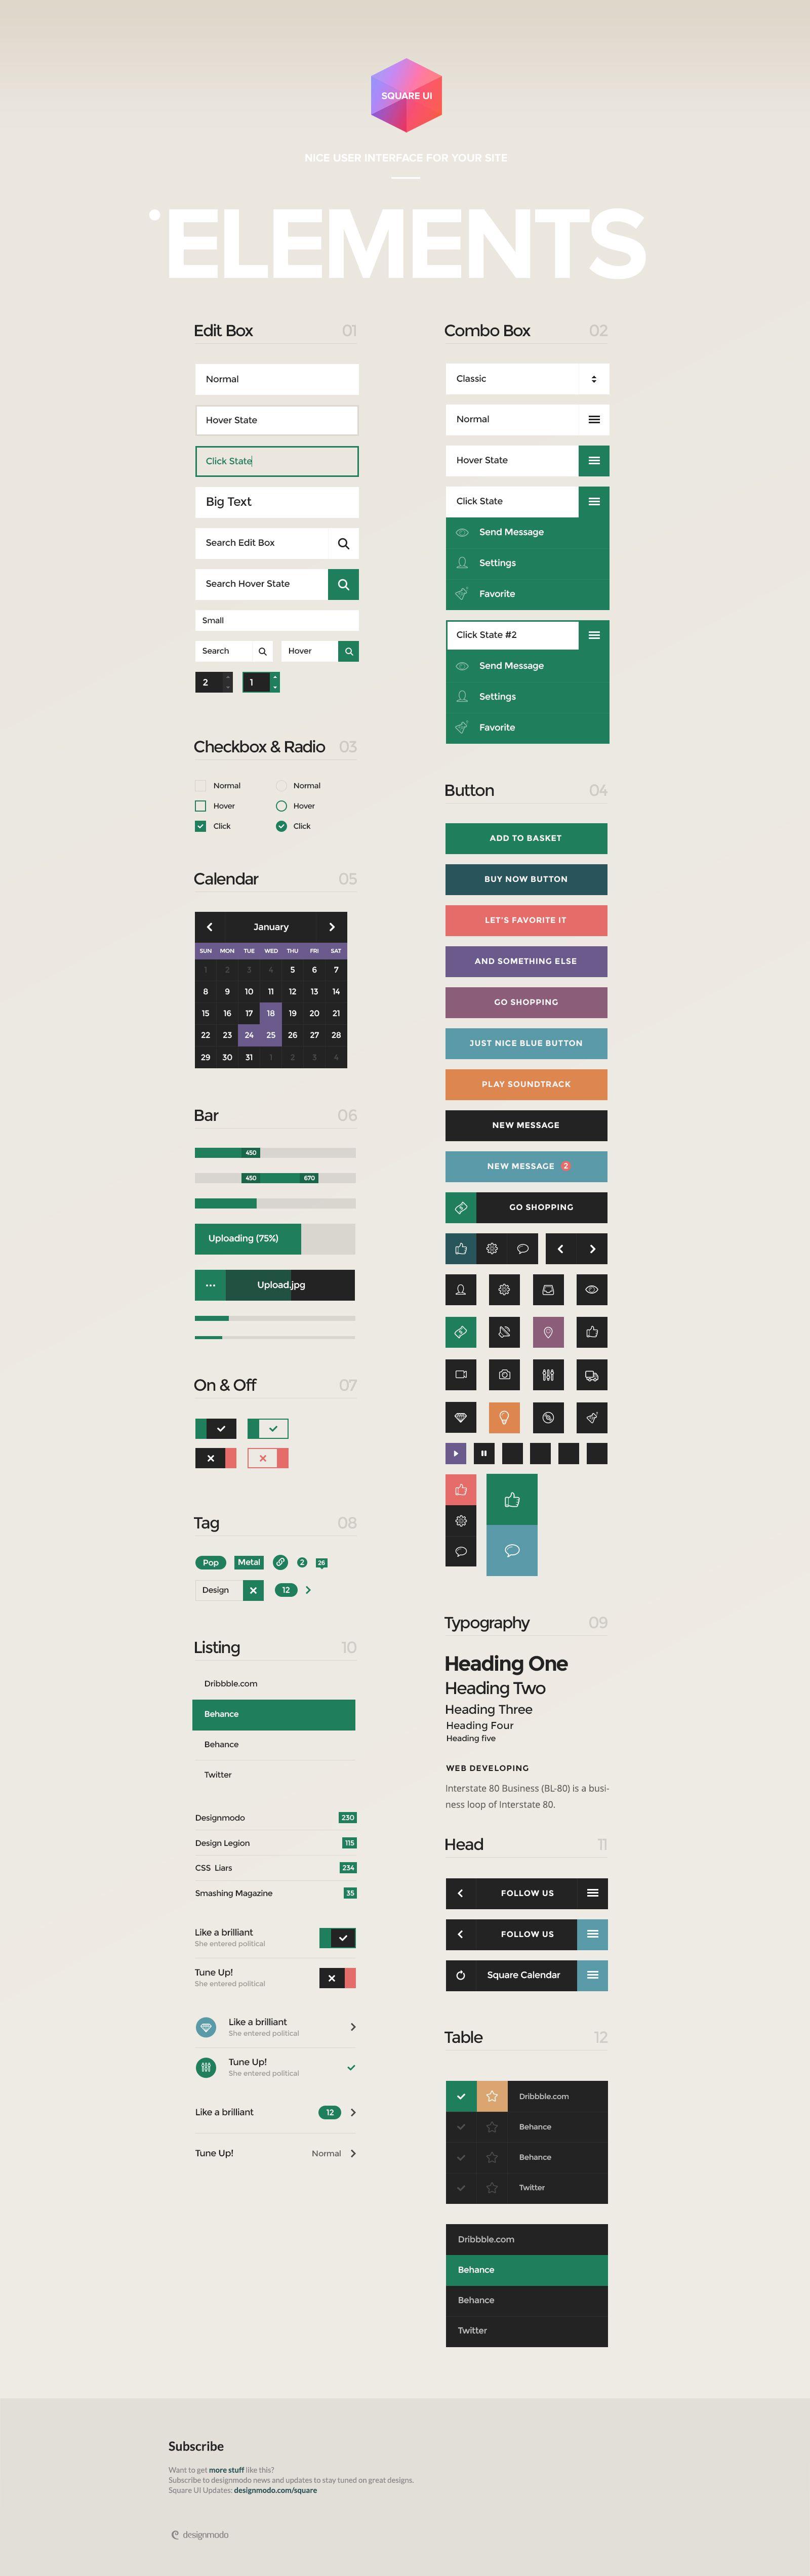 Using Square Blocks in Web Design | Mobile app flat design ...